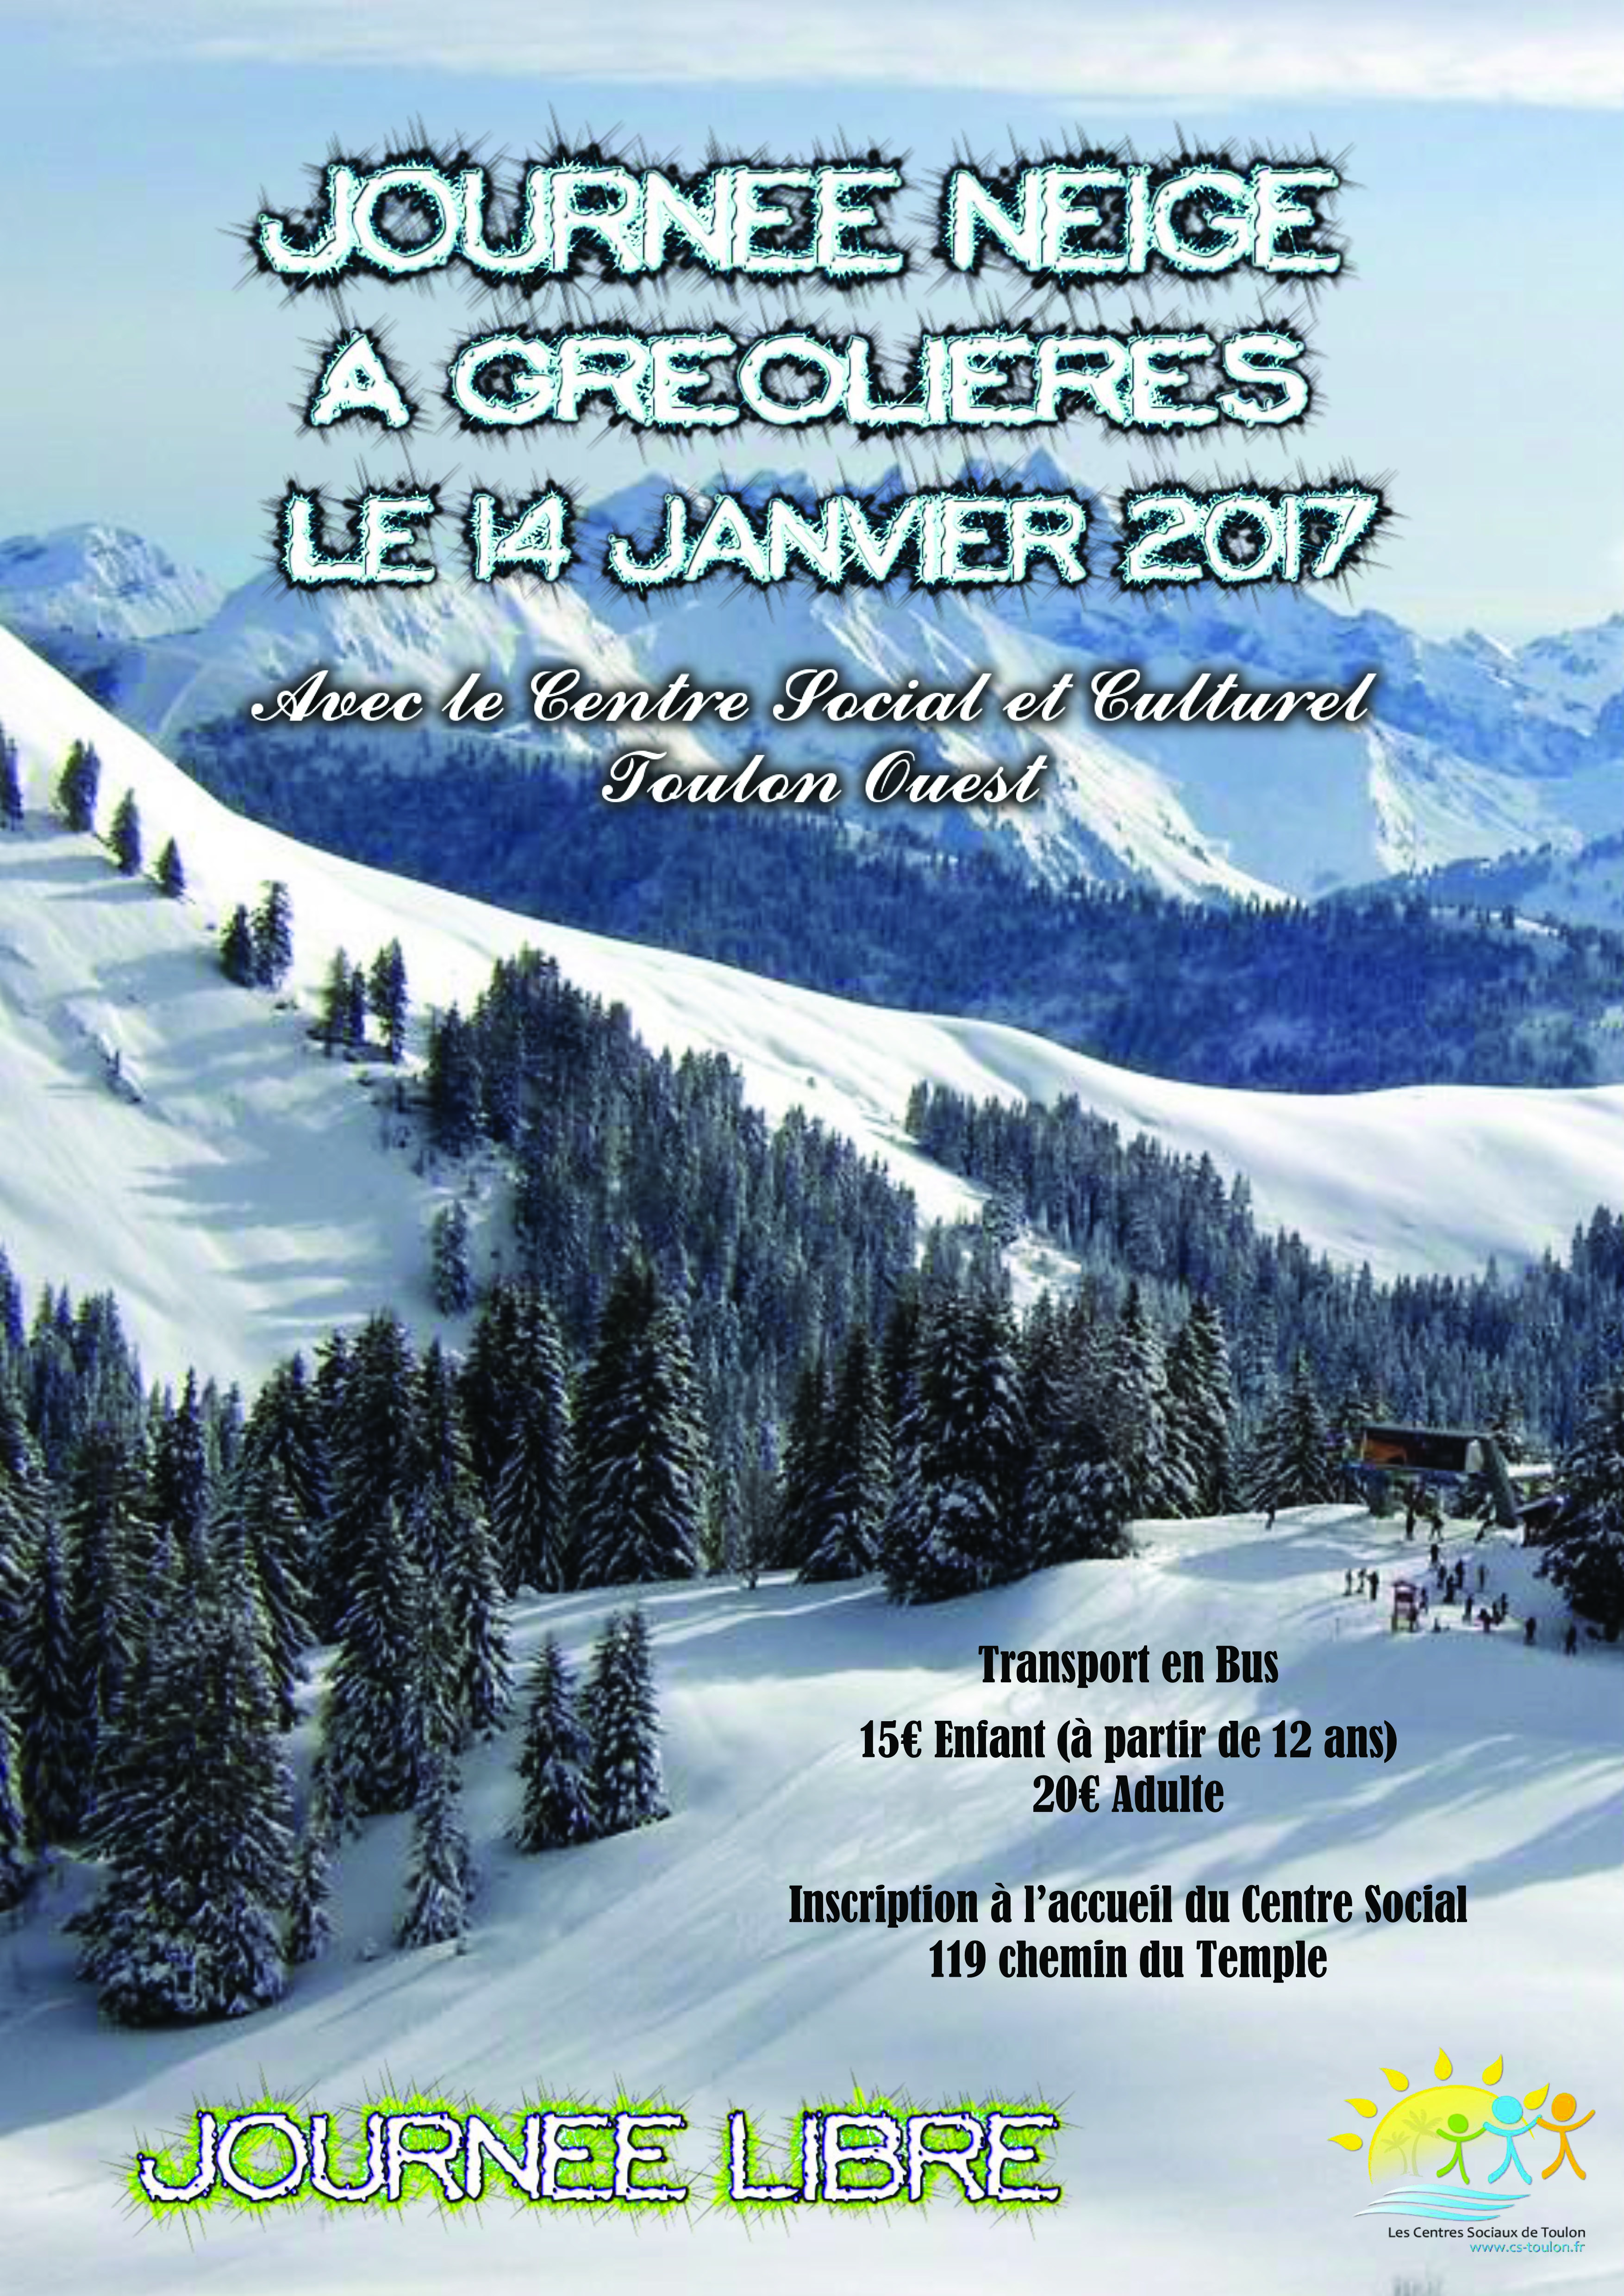 sortie-neige-greolieres-2017